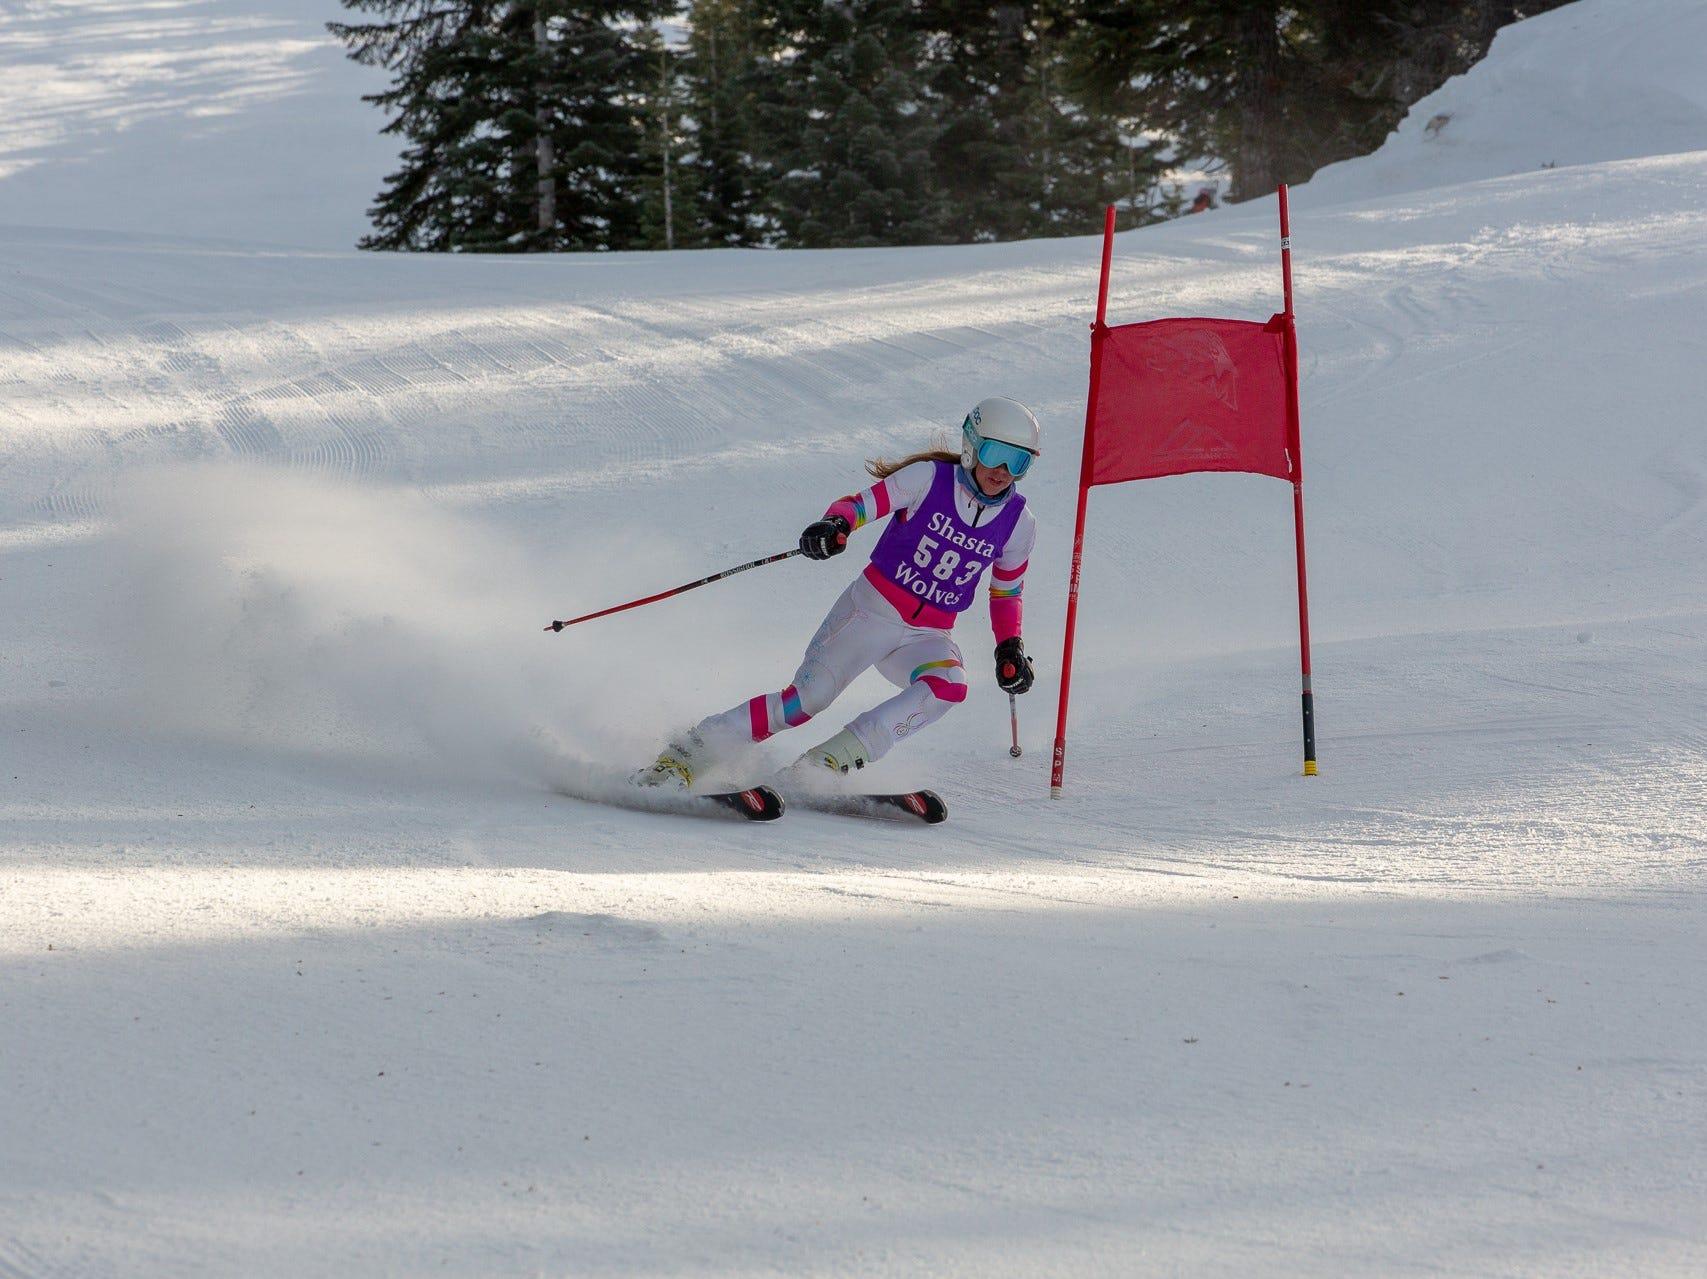 Jenna Randolph of Shasta competes in the first high school ski meet of 2019 on Monday, Jan. 14 at Mt. Shasta Ski Park.